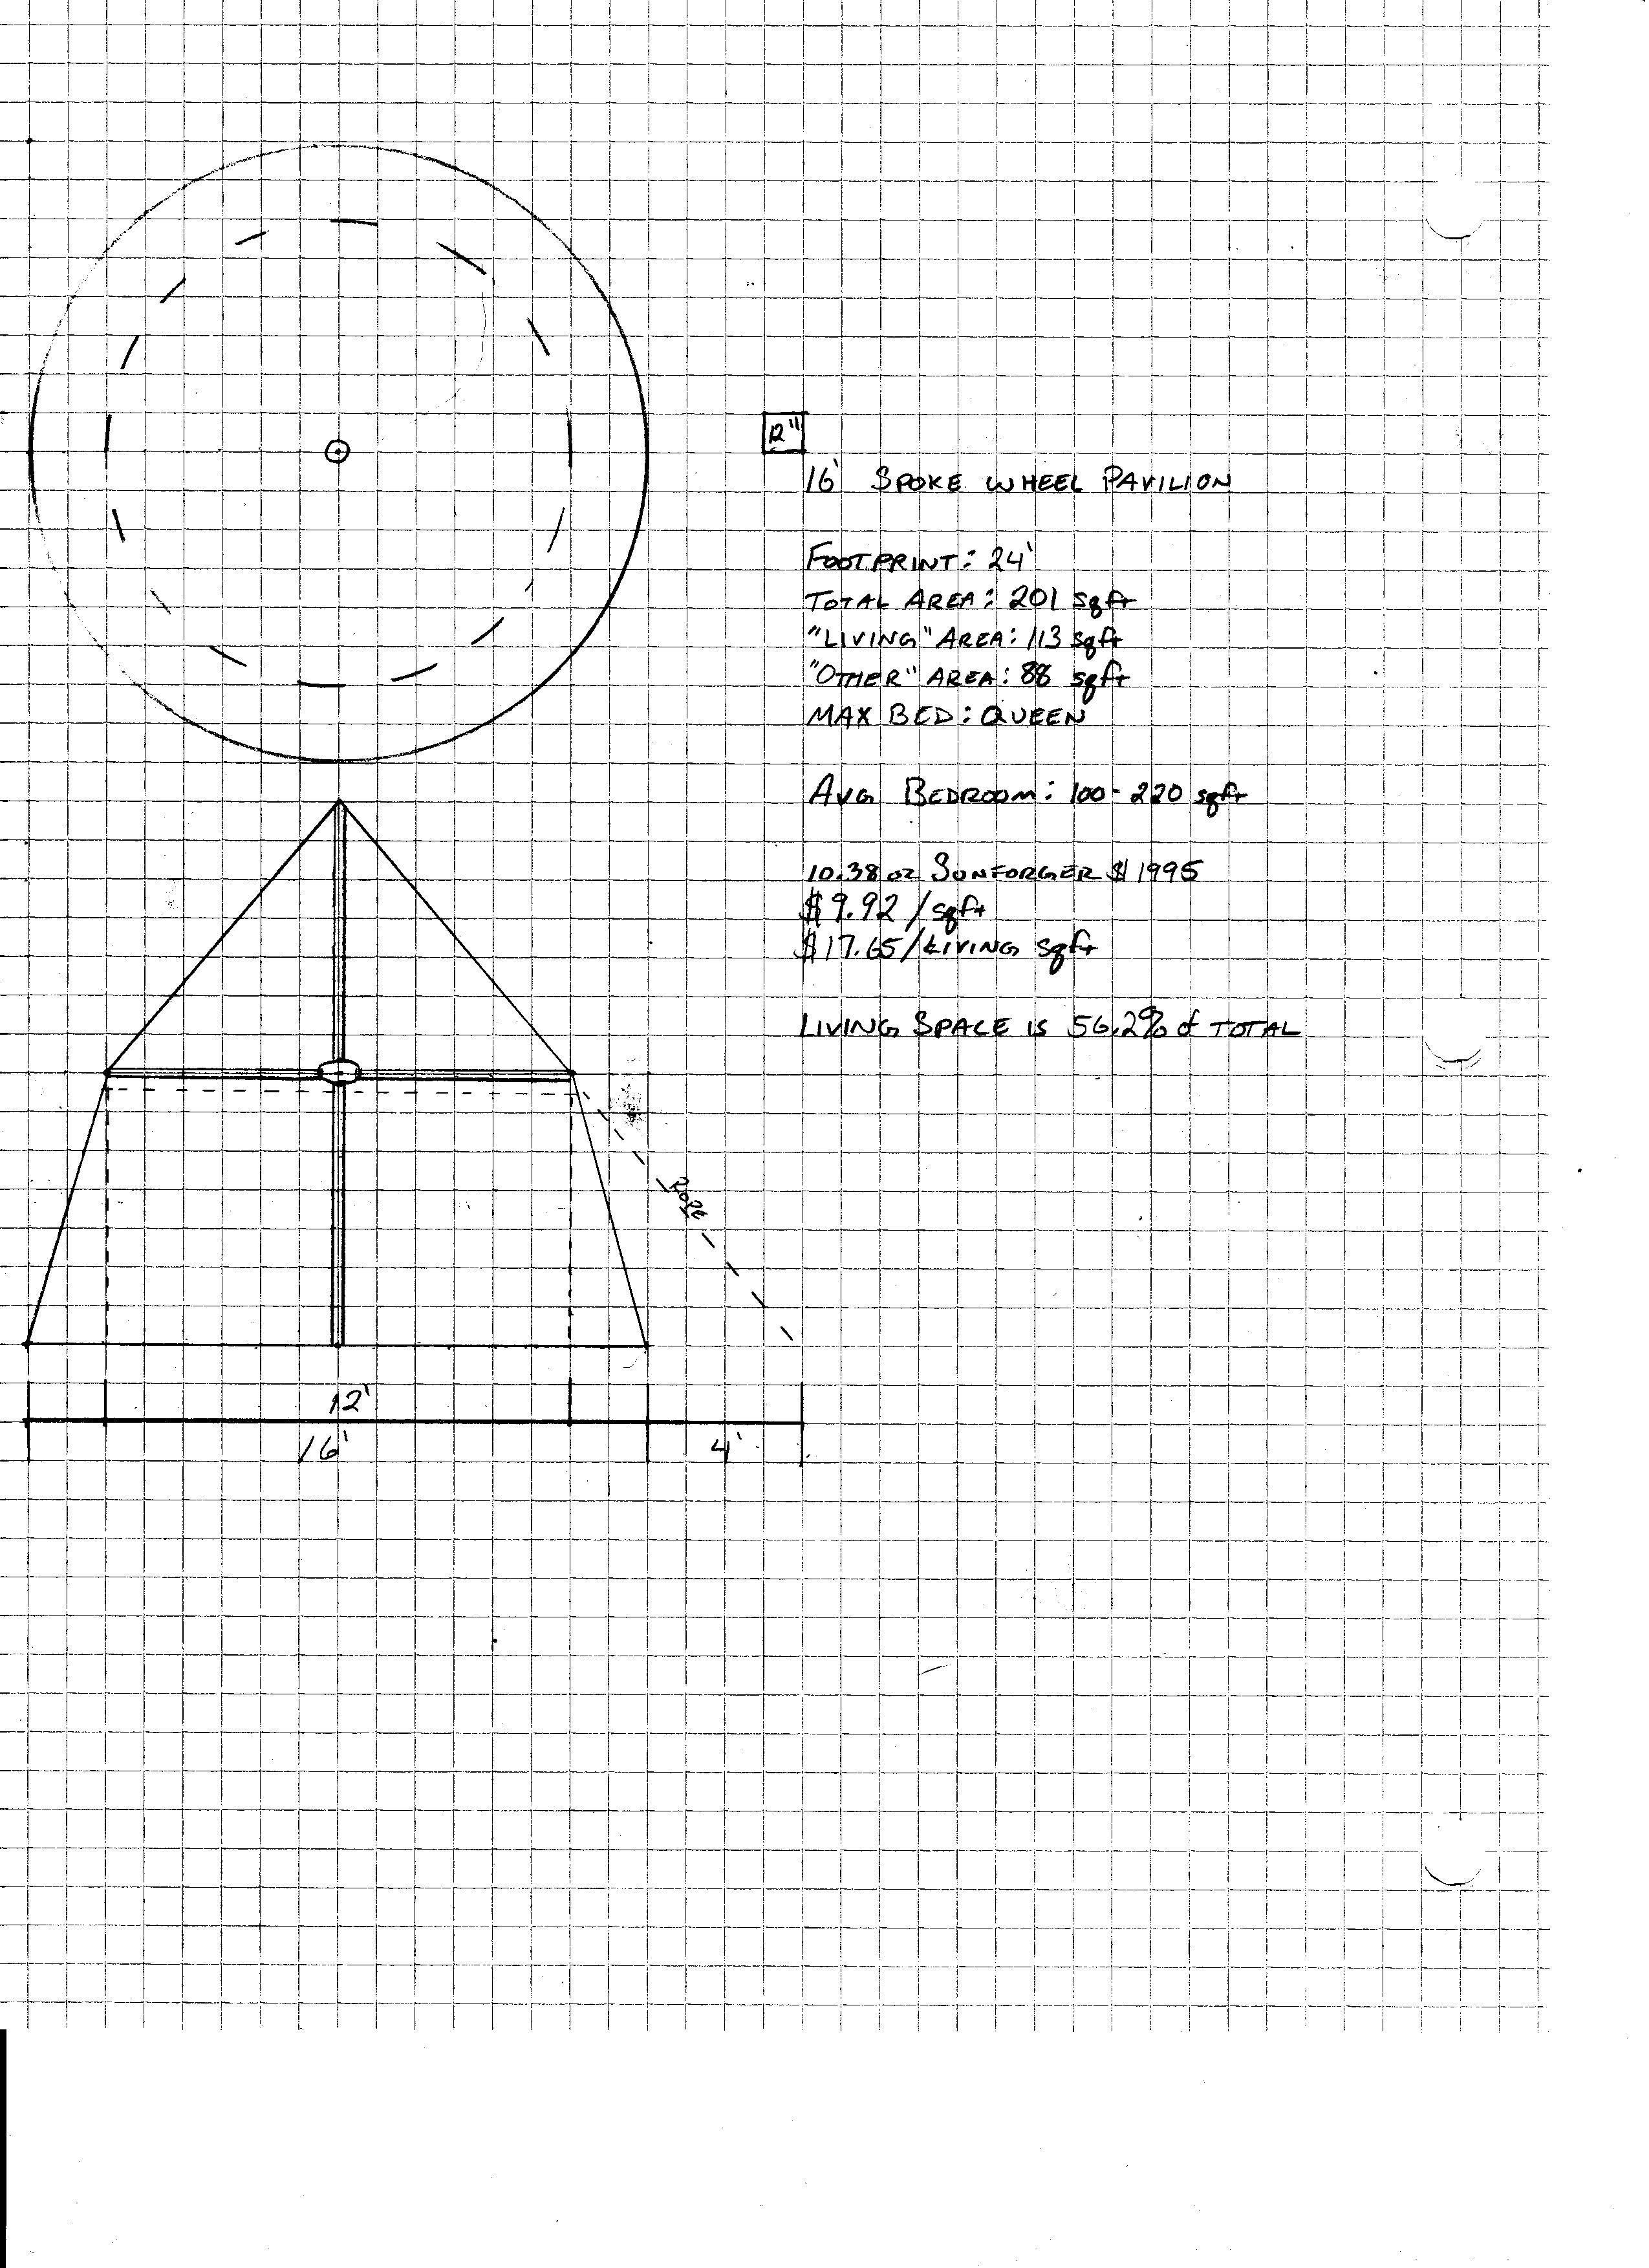 Tent Drawings 2.jpeg